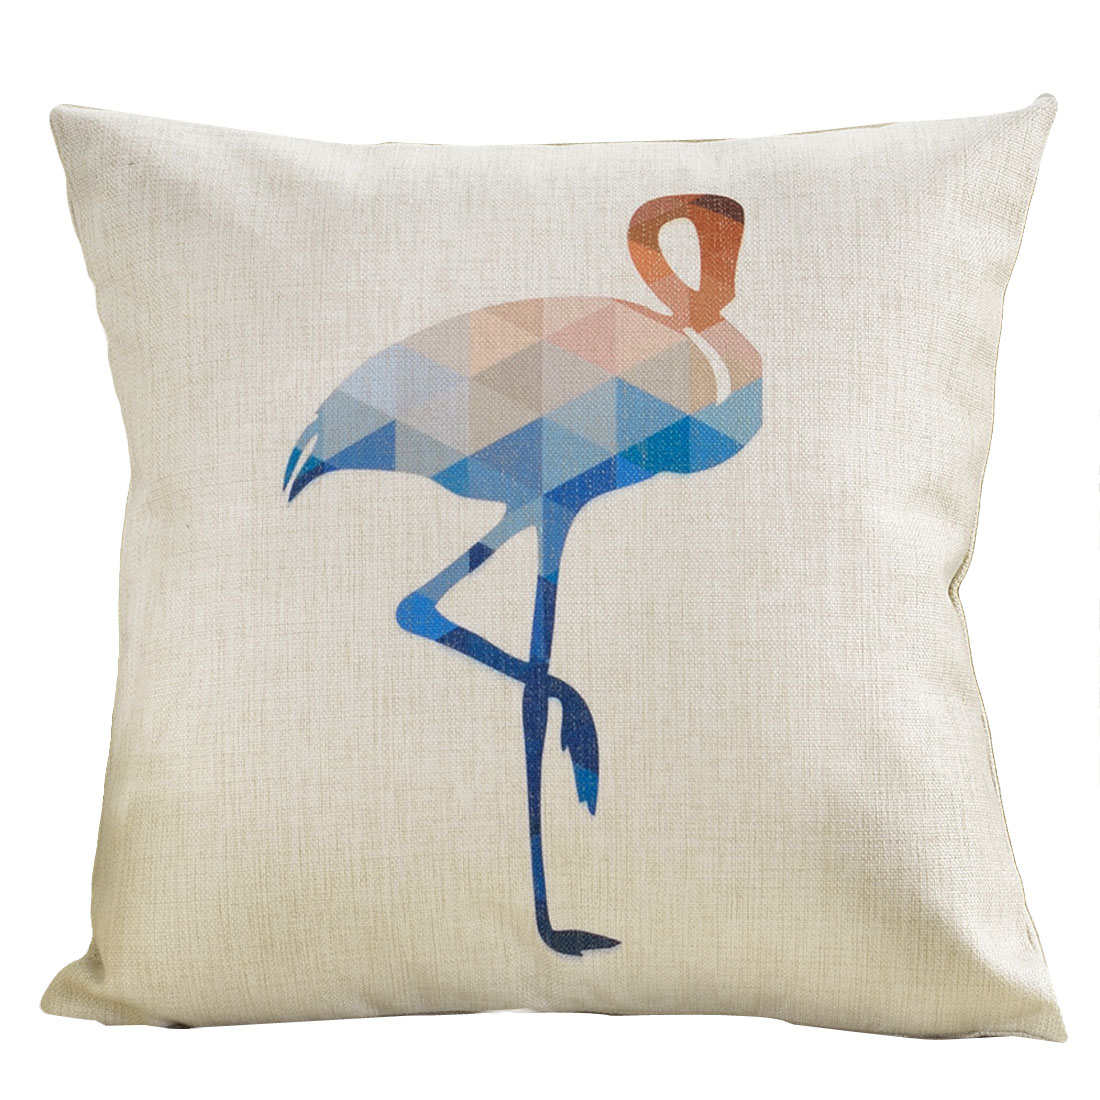 Sofa Cotton Linen Ostrich Pattern Square Design Waist Throw Cushion Pillow Cover